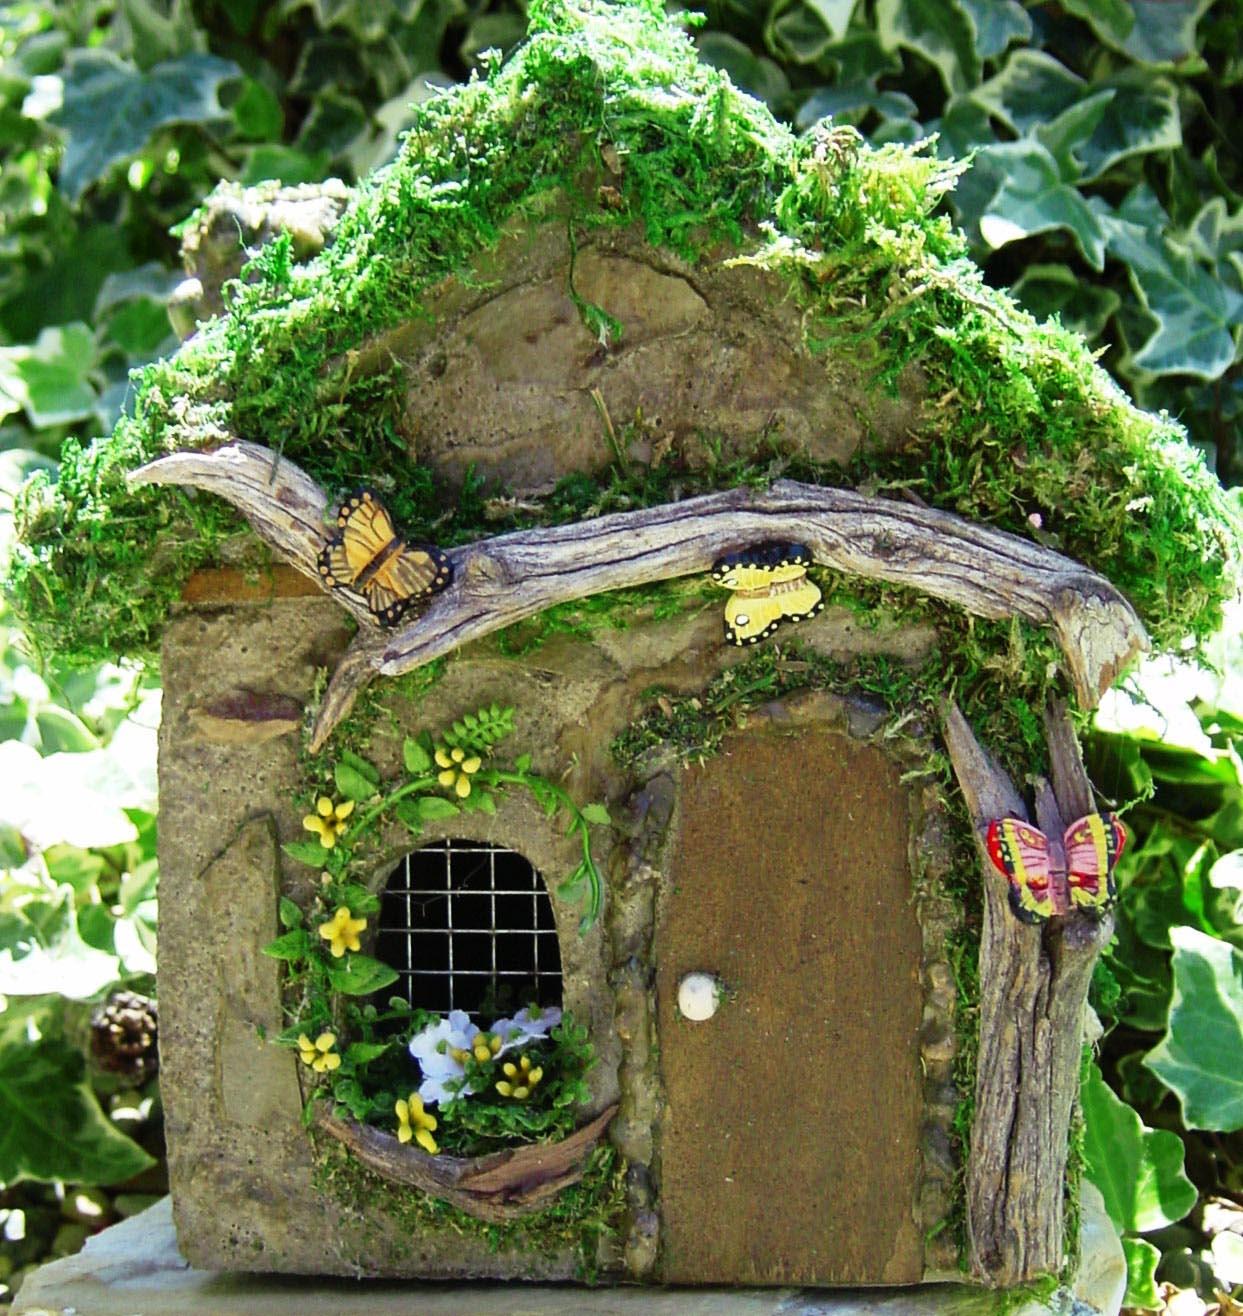 Fairy Houses in the Garden